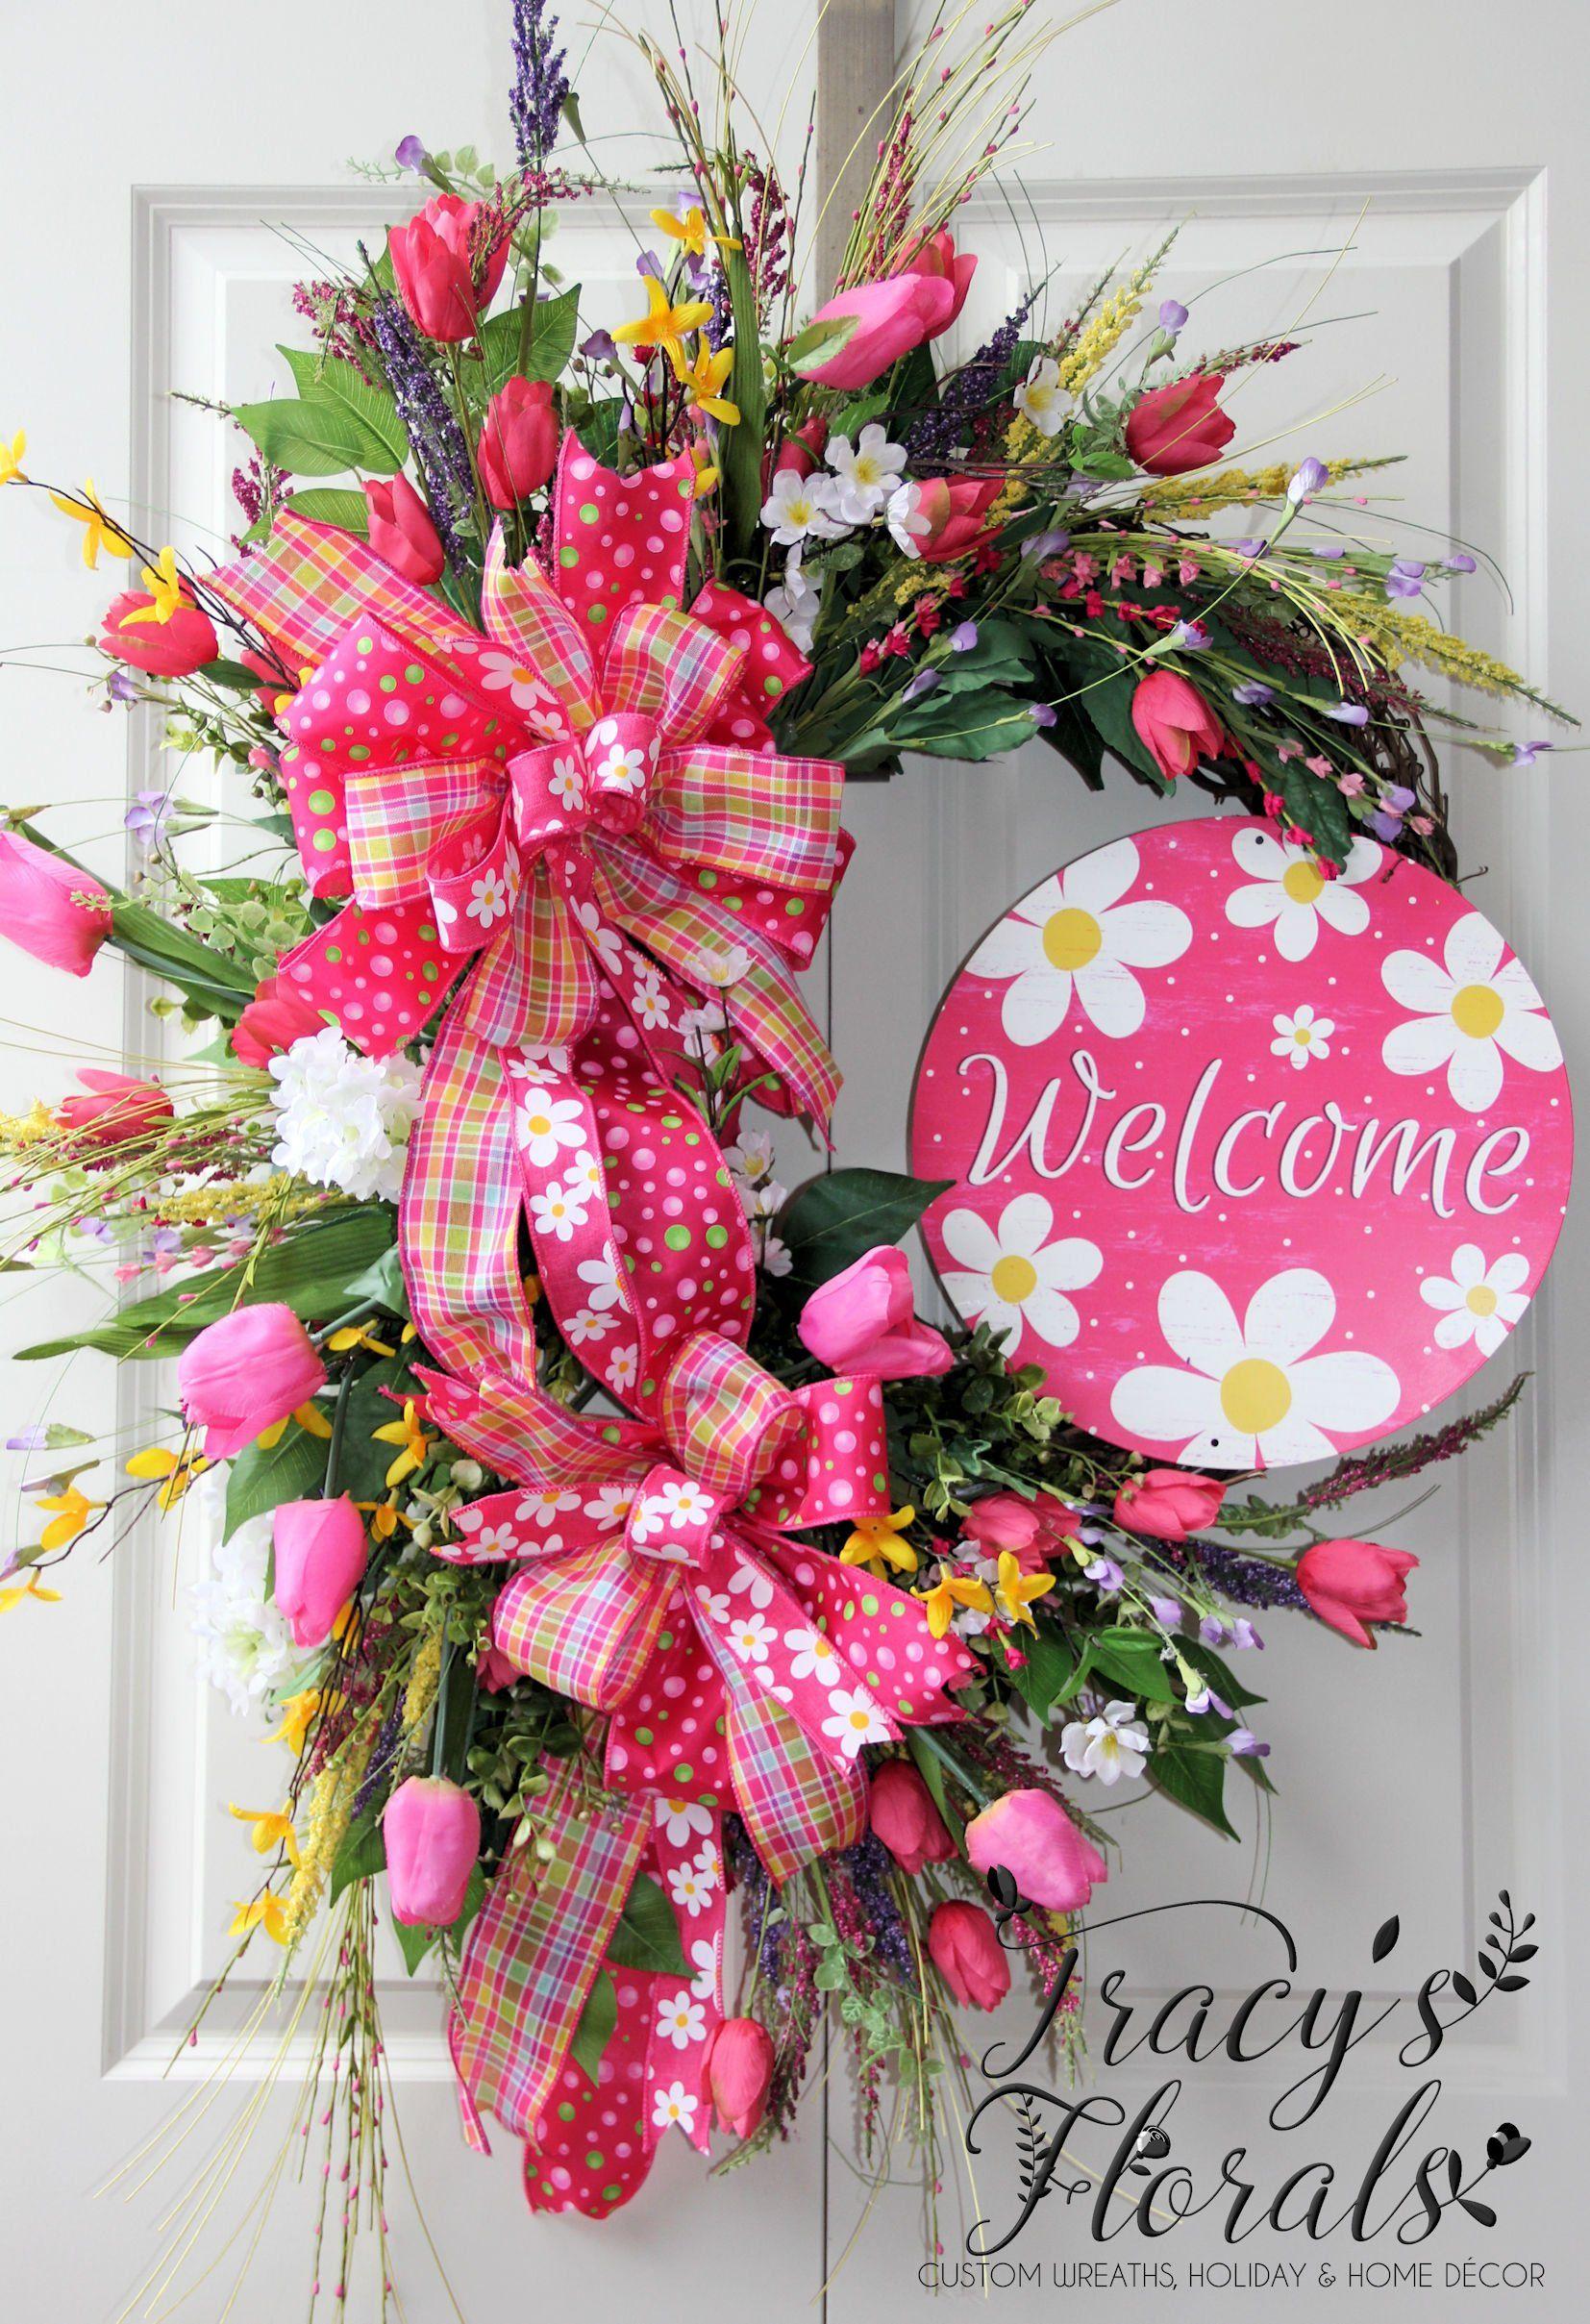 Photo of Spring wreath, XL spring wreath, deluxe spring wreath, spring door hanger, spring decor, Welcome wreath, tulip wreath, hot pink wreath